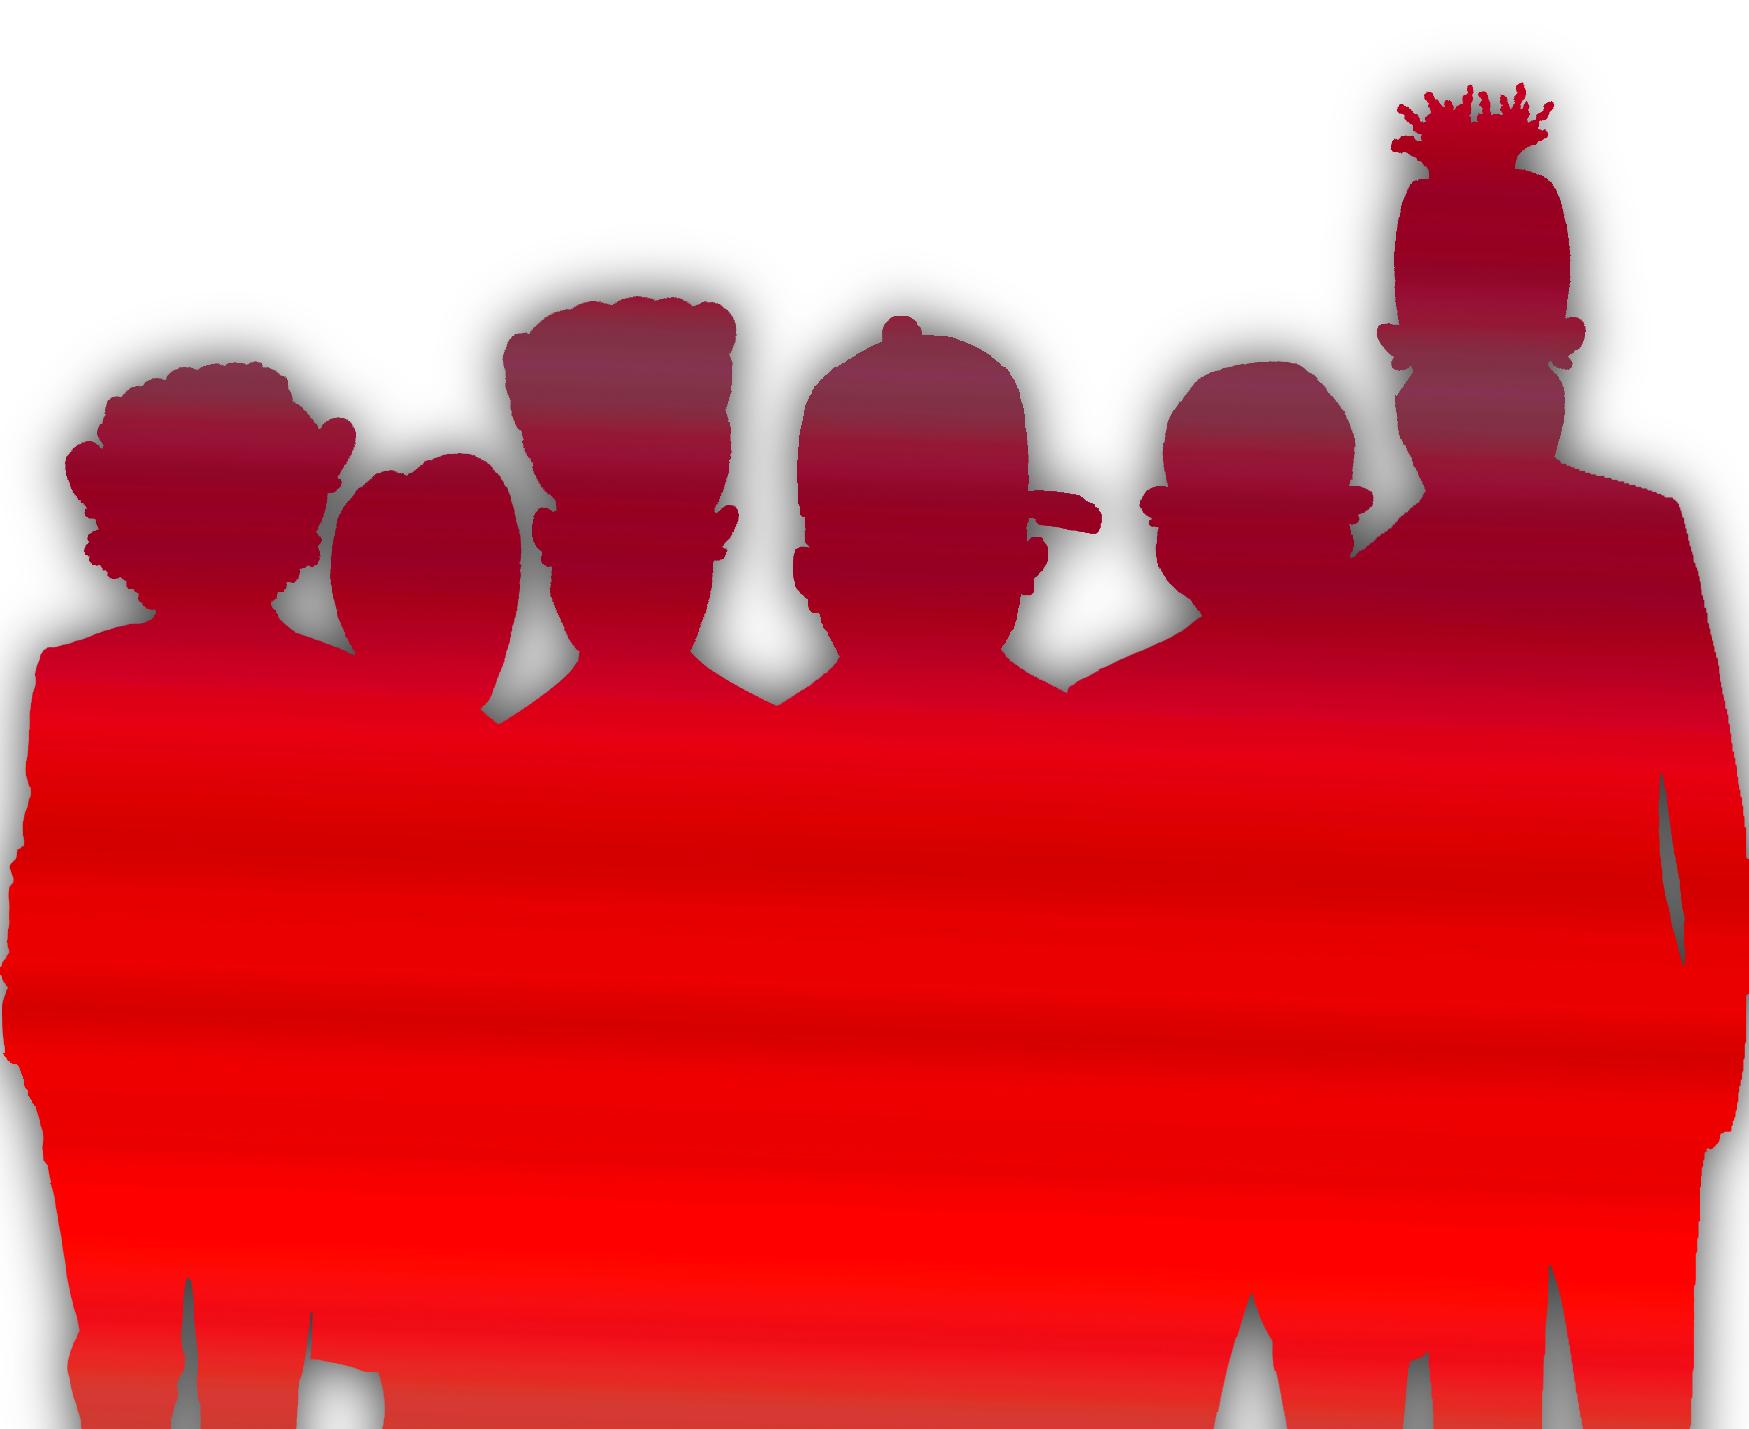 BlackDroog Band-Alternate-REd Shadow